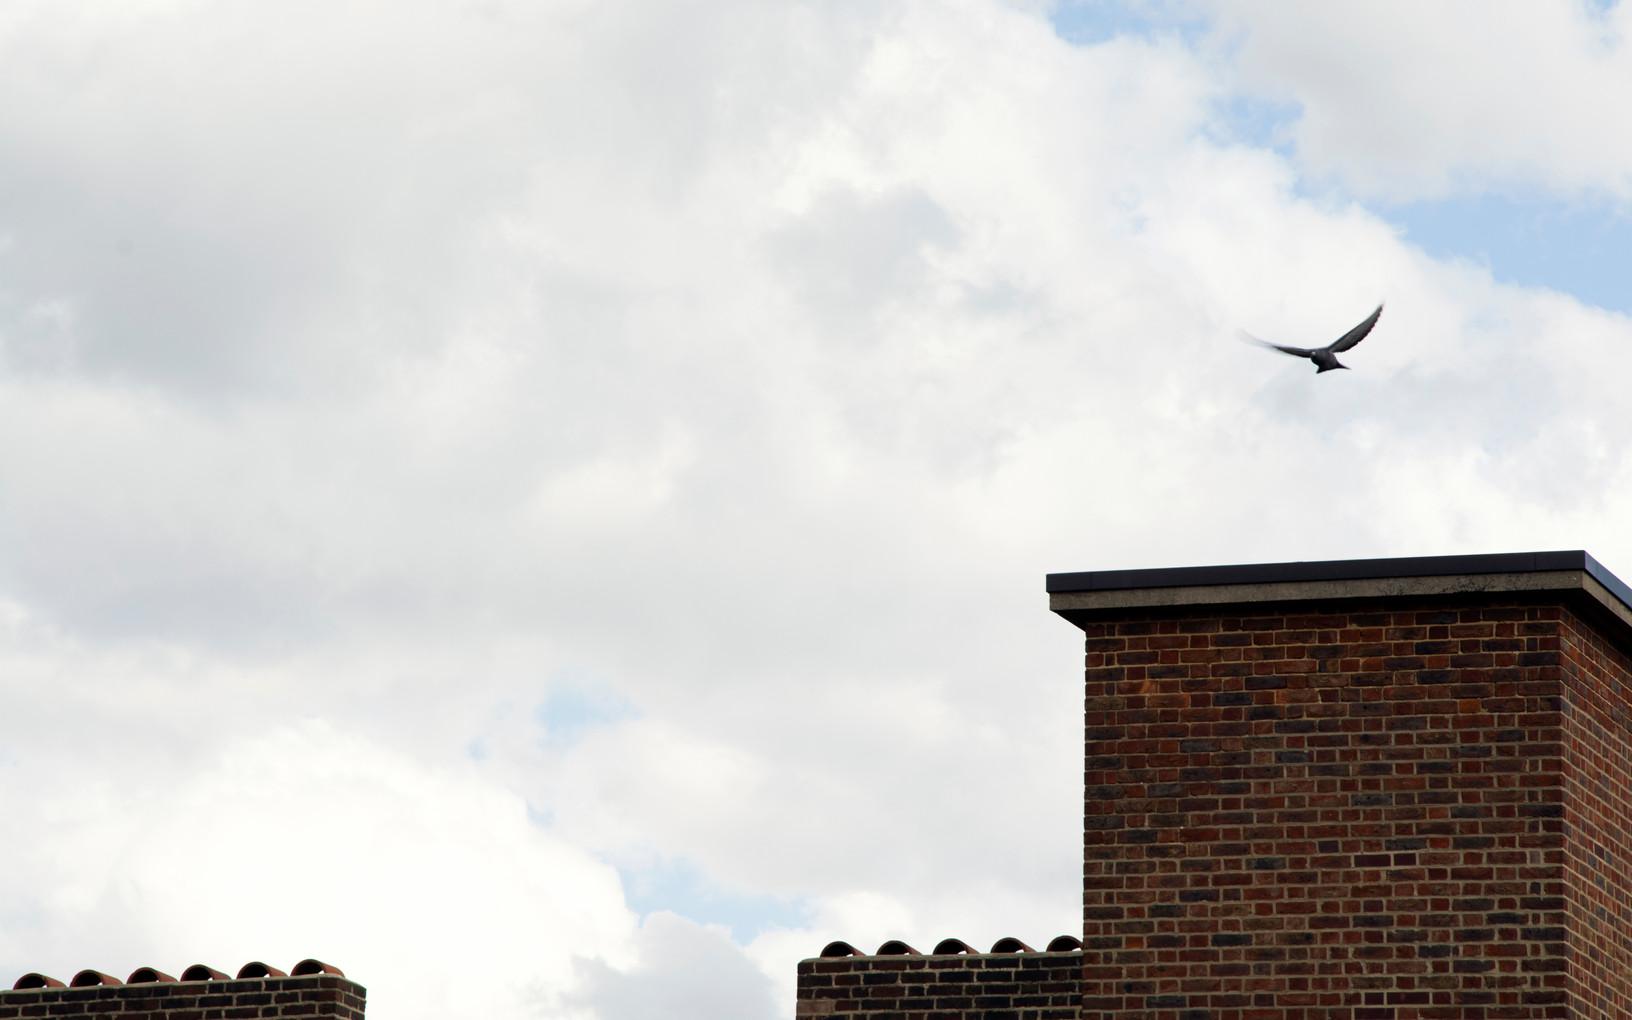 Pidgeon taking off | London, April 2020..